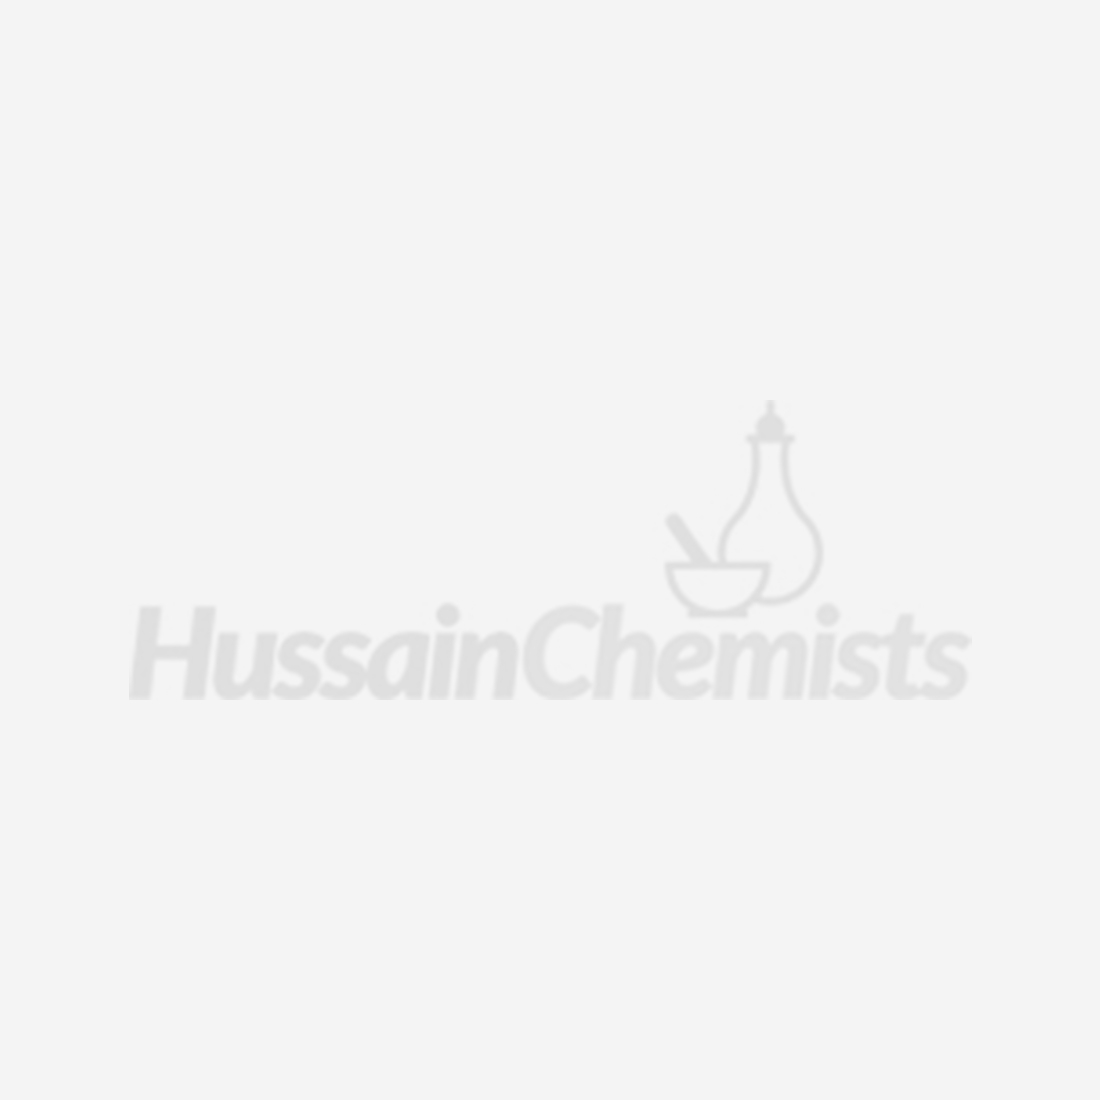 Nurofen Cold & Flu Relief 200mg/5mg Tablets - 16